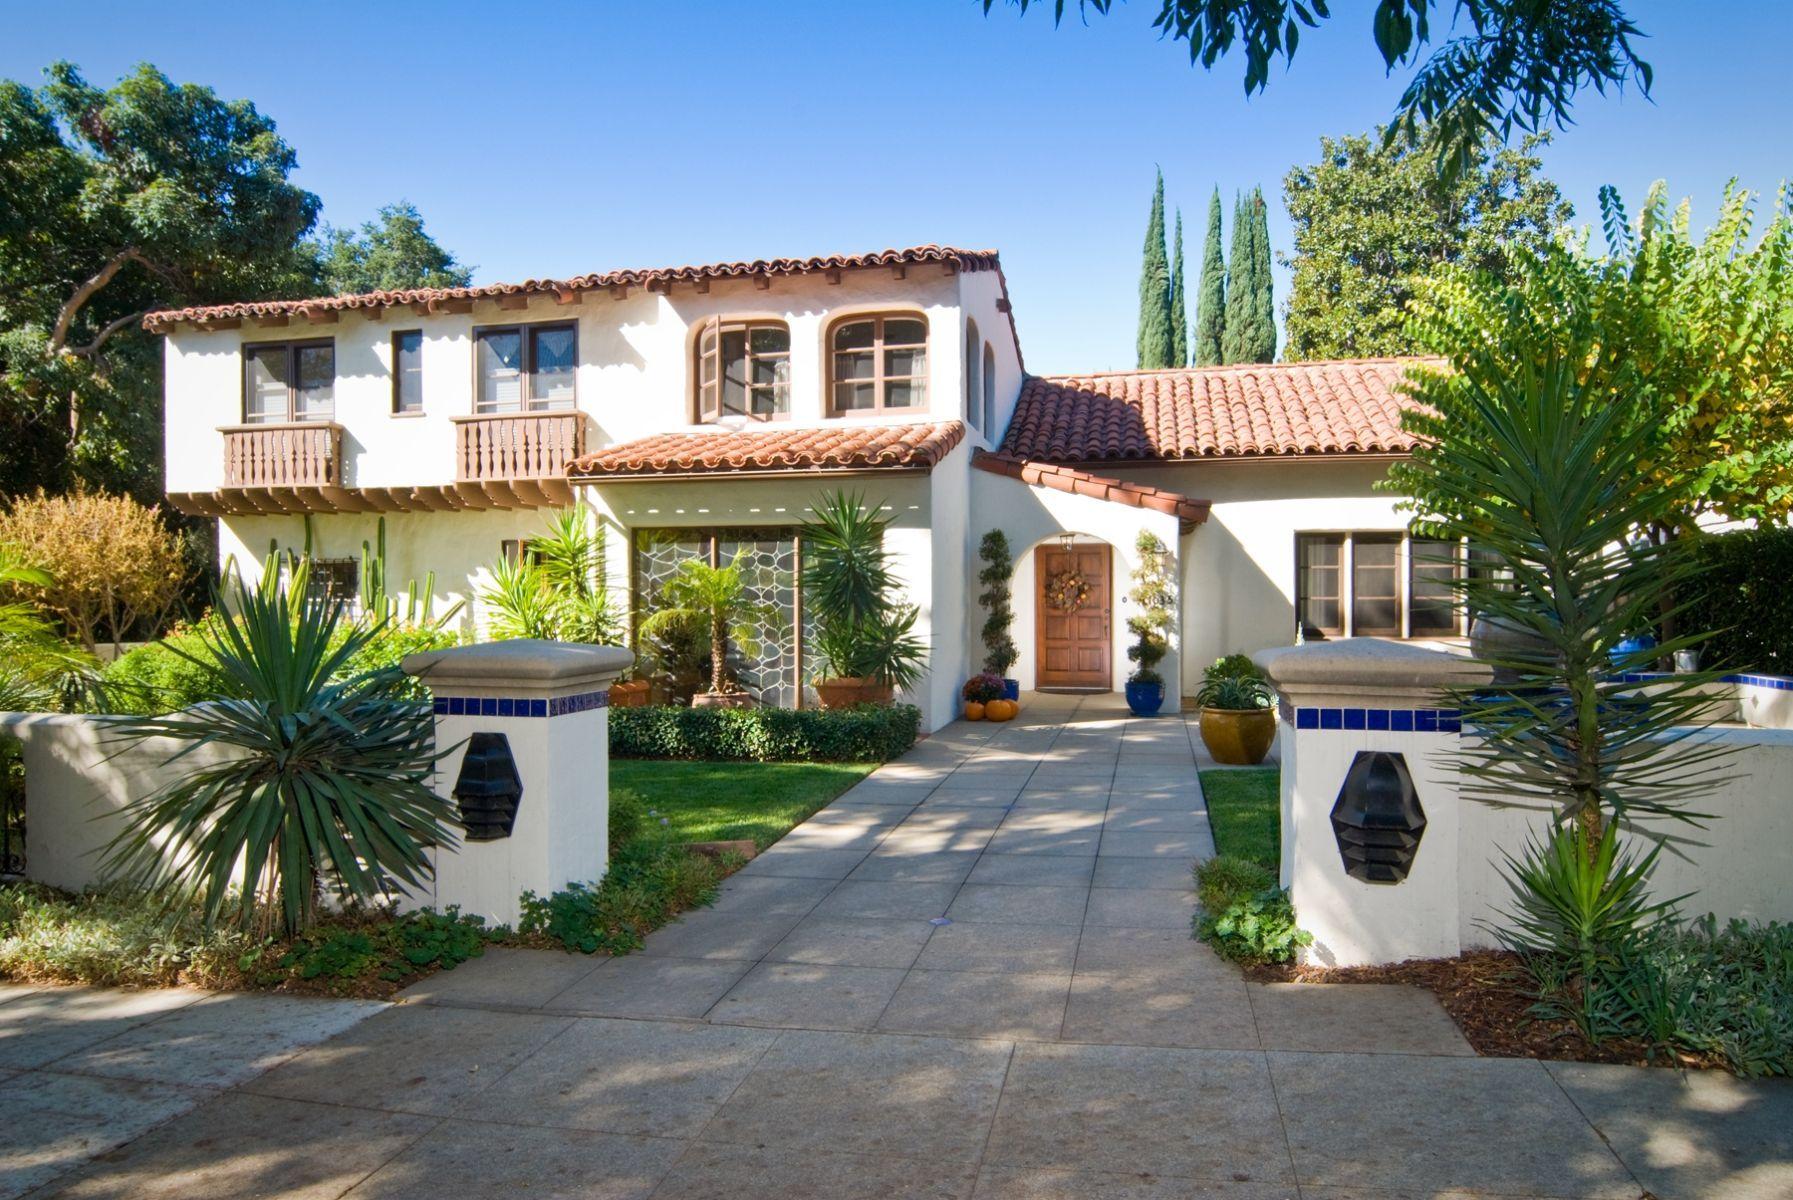 Historic Claremont home